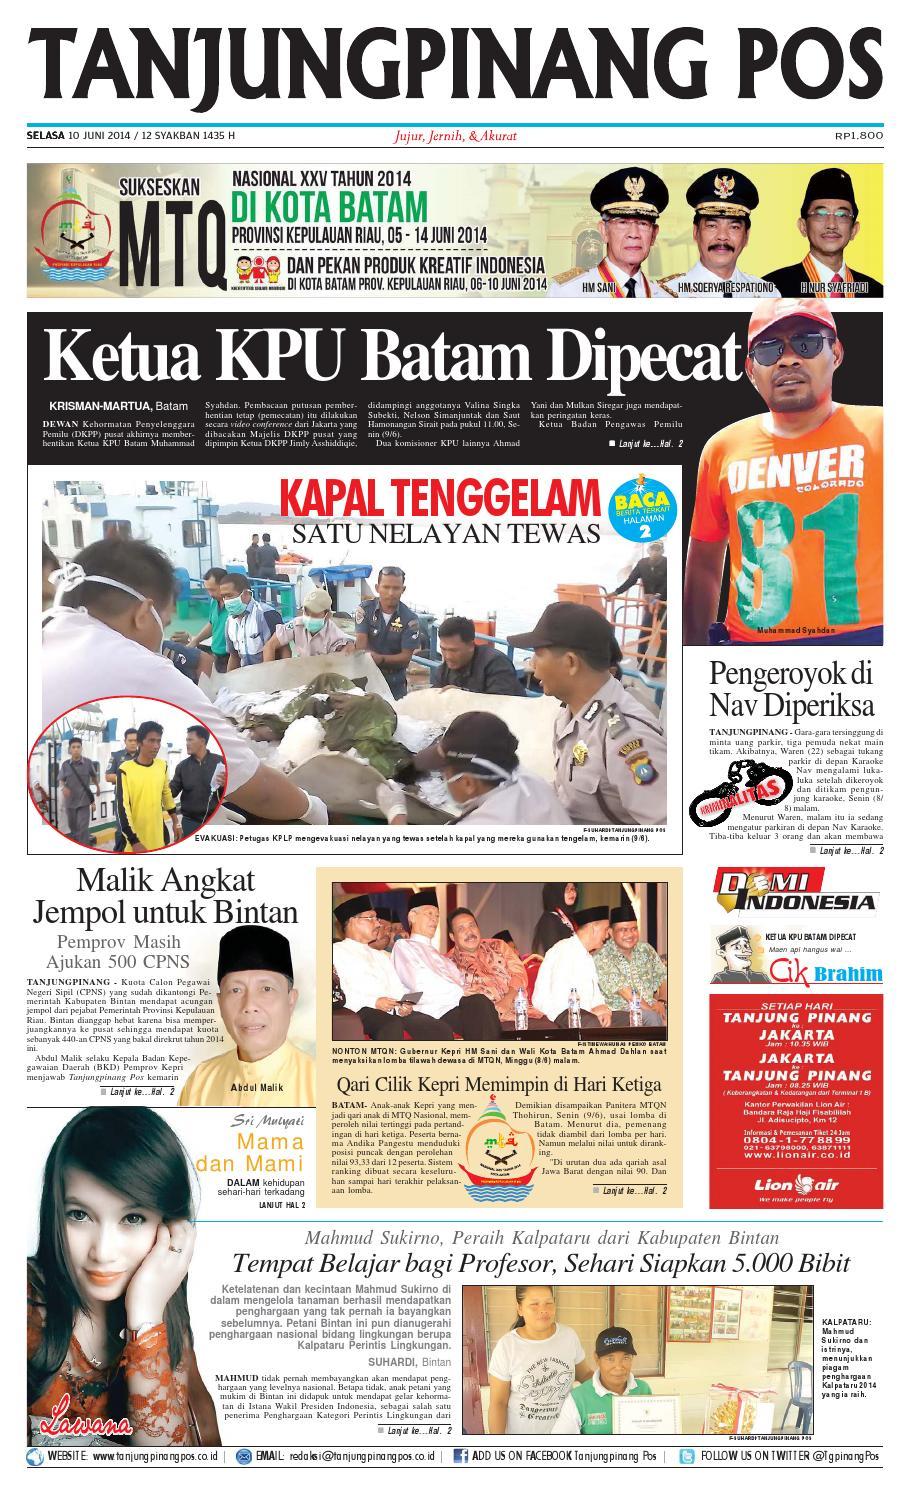 Epaper Tanjungpinangpos 10 Juni 2014 By Issuu Produk Ukm Bumn Bunge Tanjung Betabur